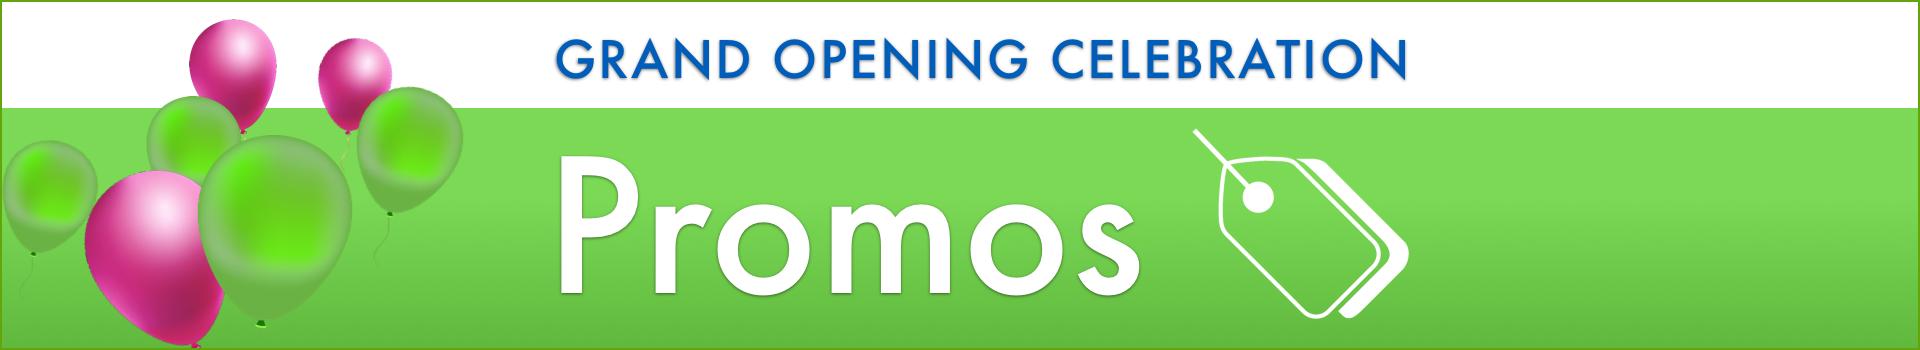 Promos_Landing_Page_1920x350